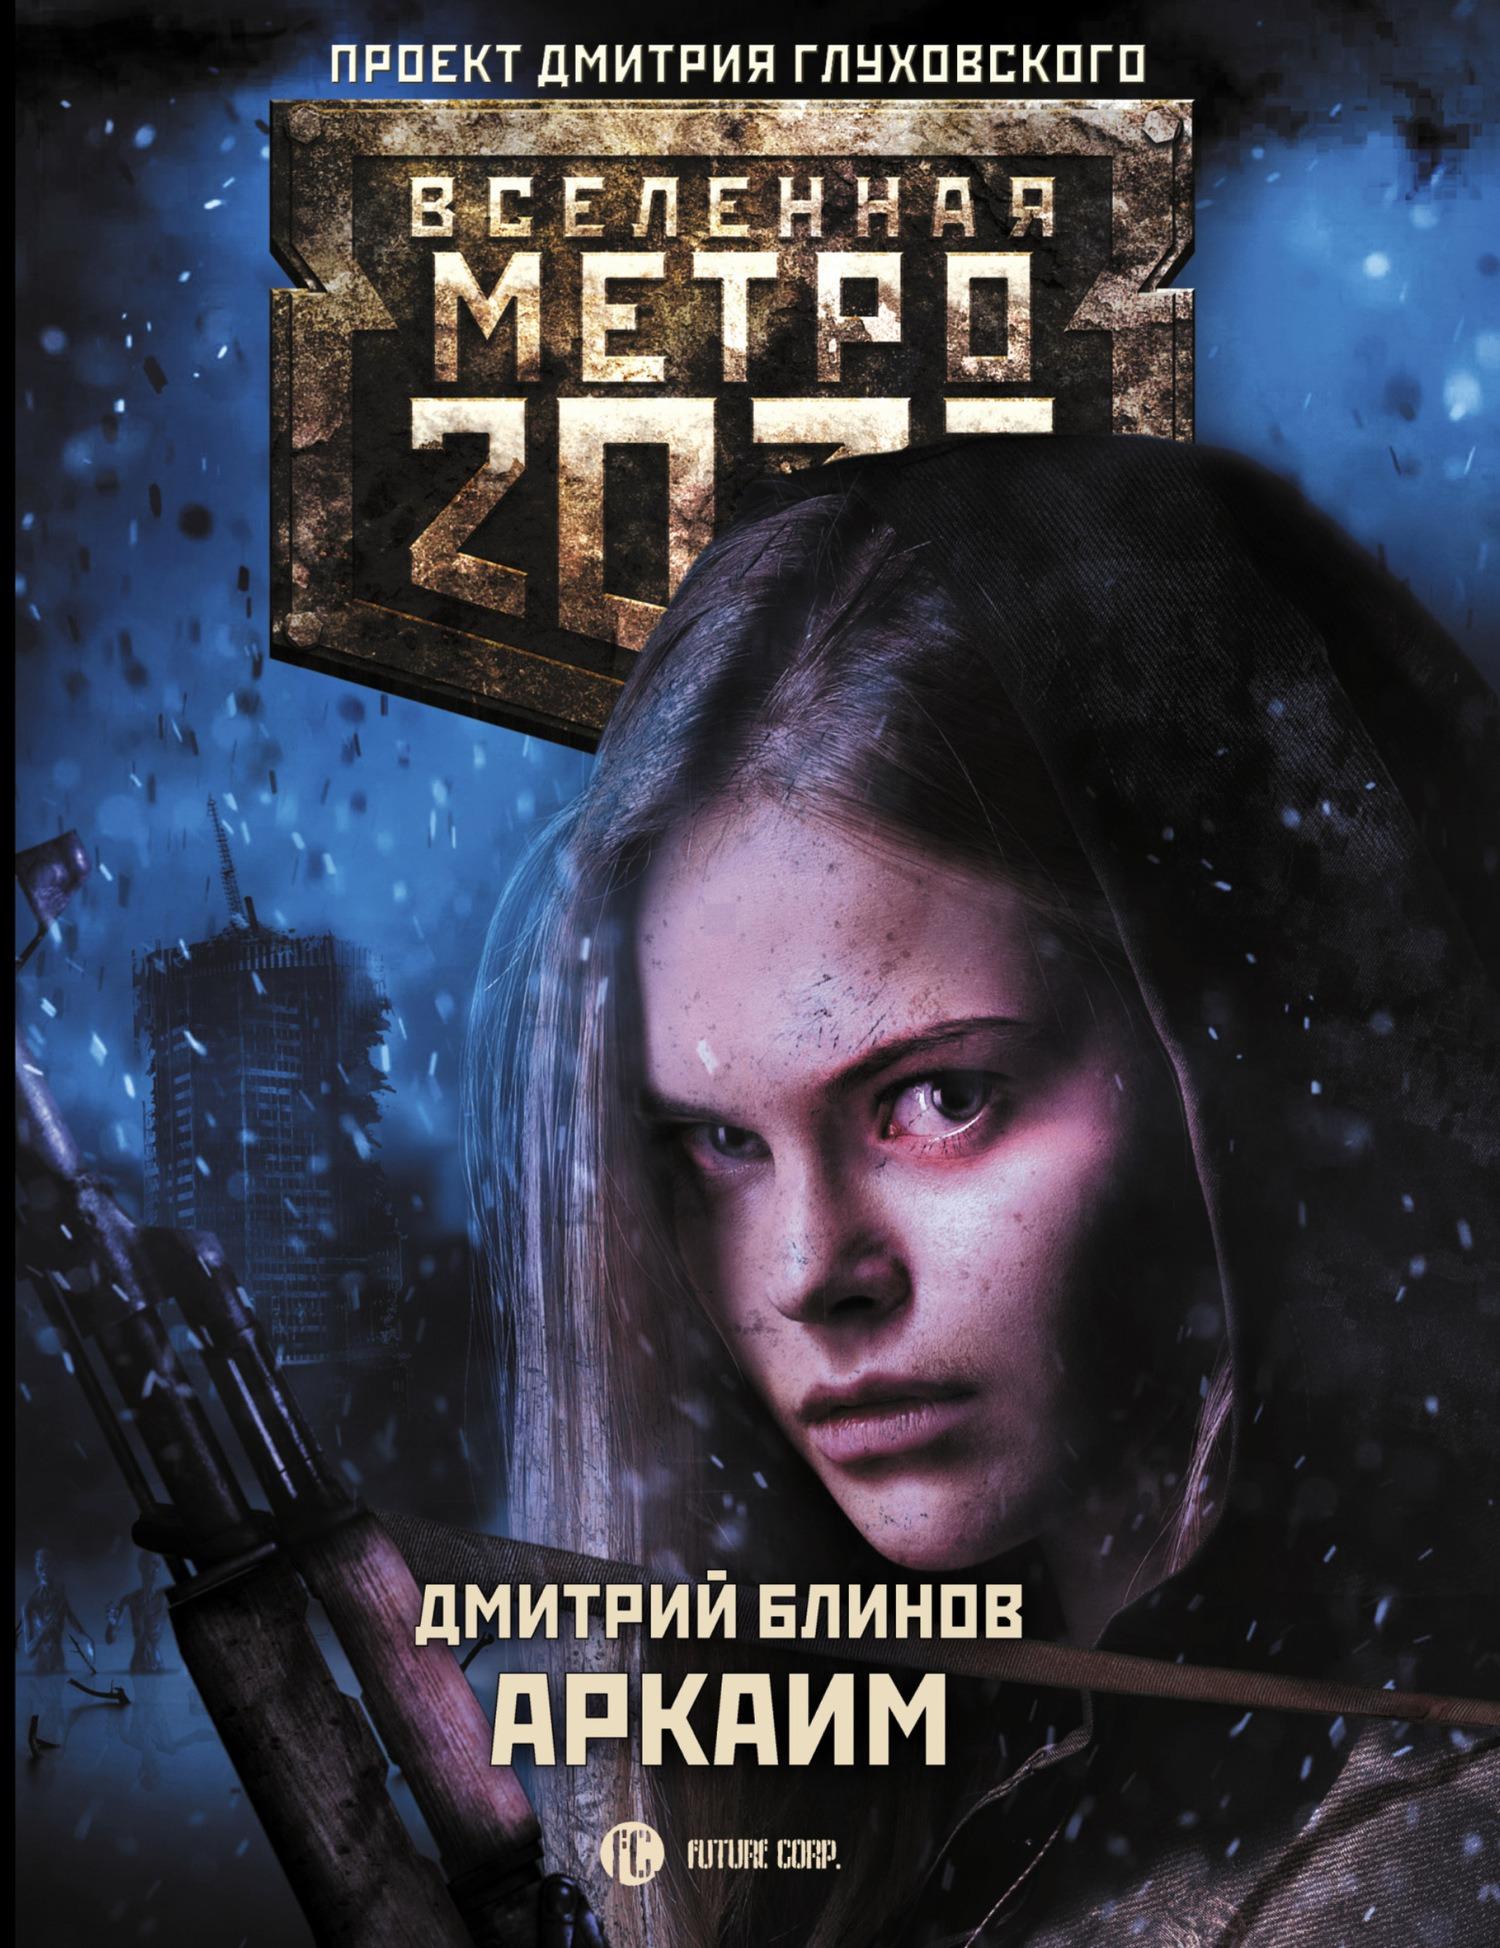 Скачать бесплатно Метро 2033: Аркаим